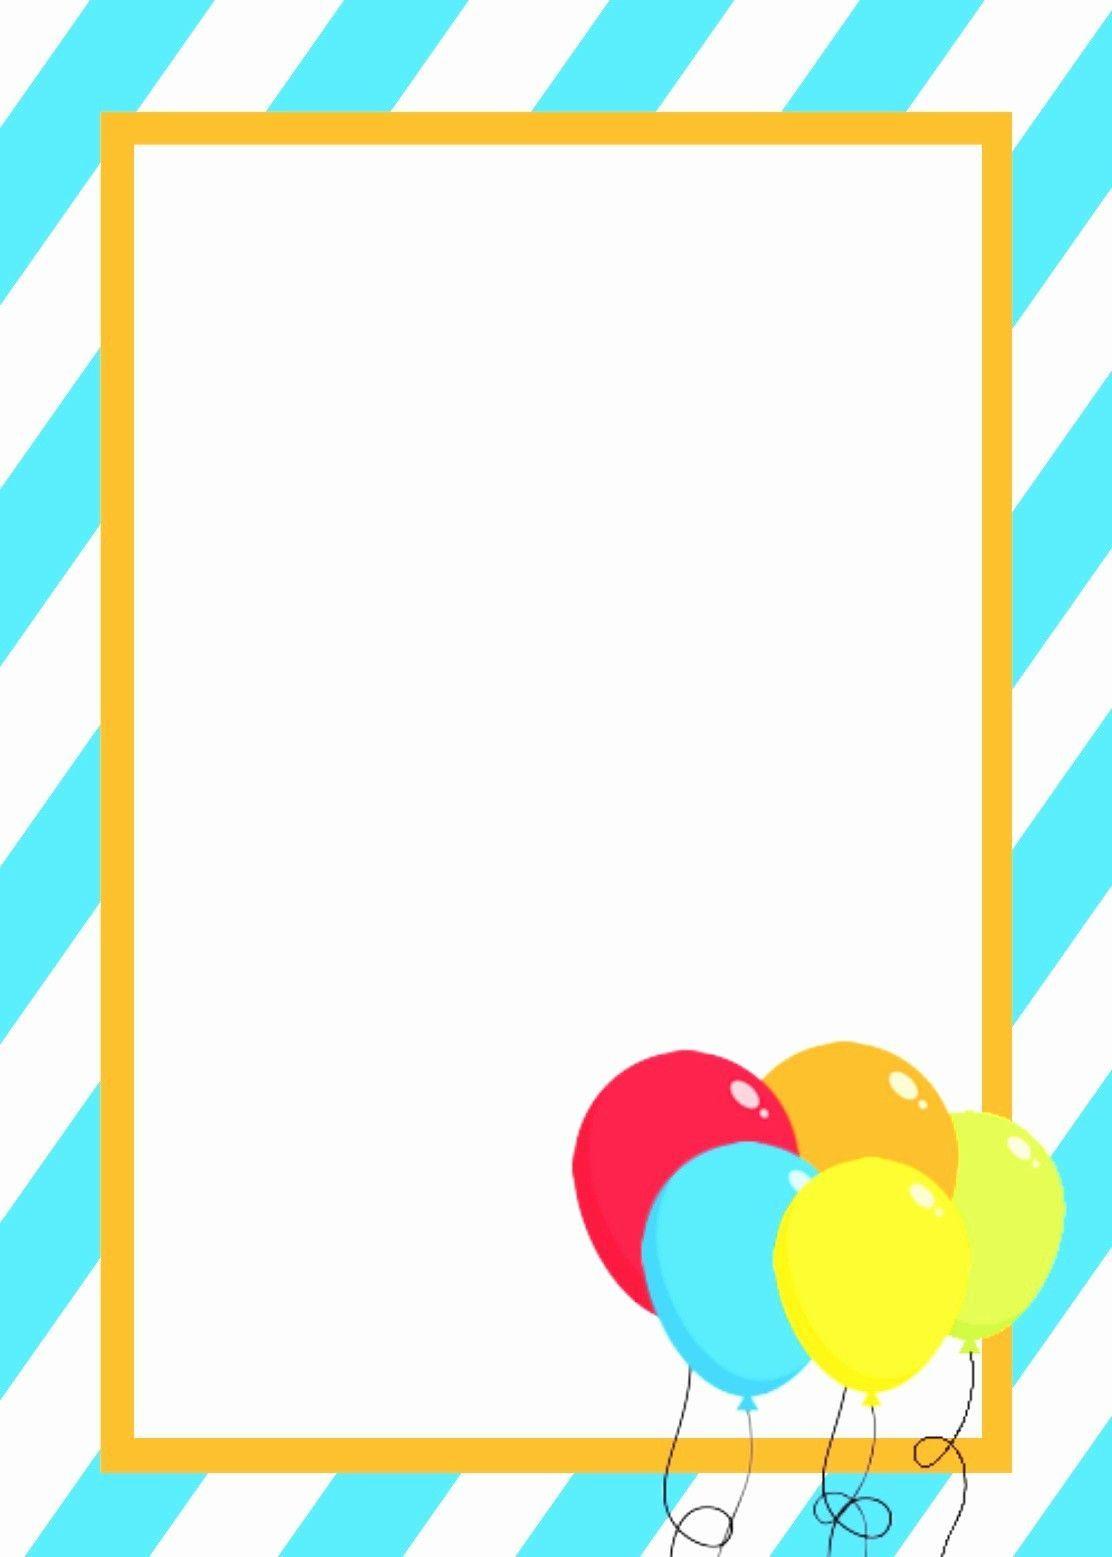 004 Imposing Birthday Invitation Template Word 2020 Example Full